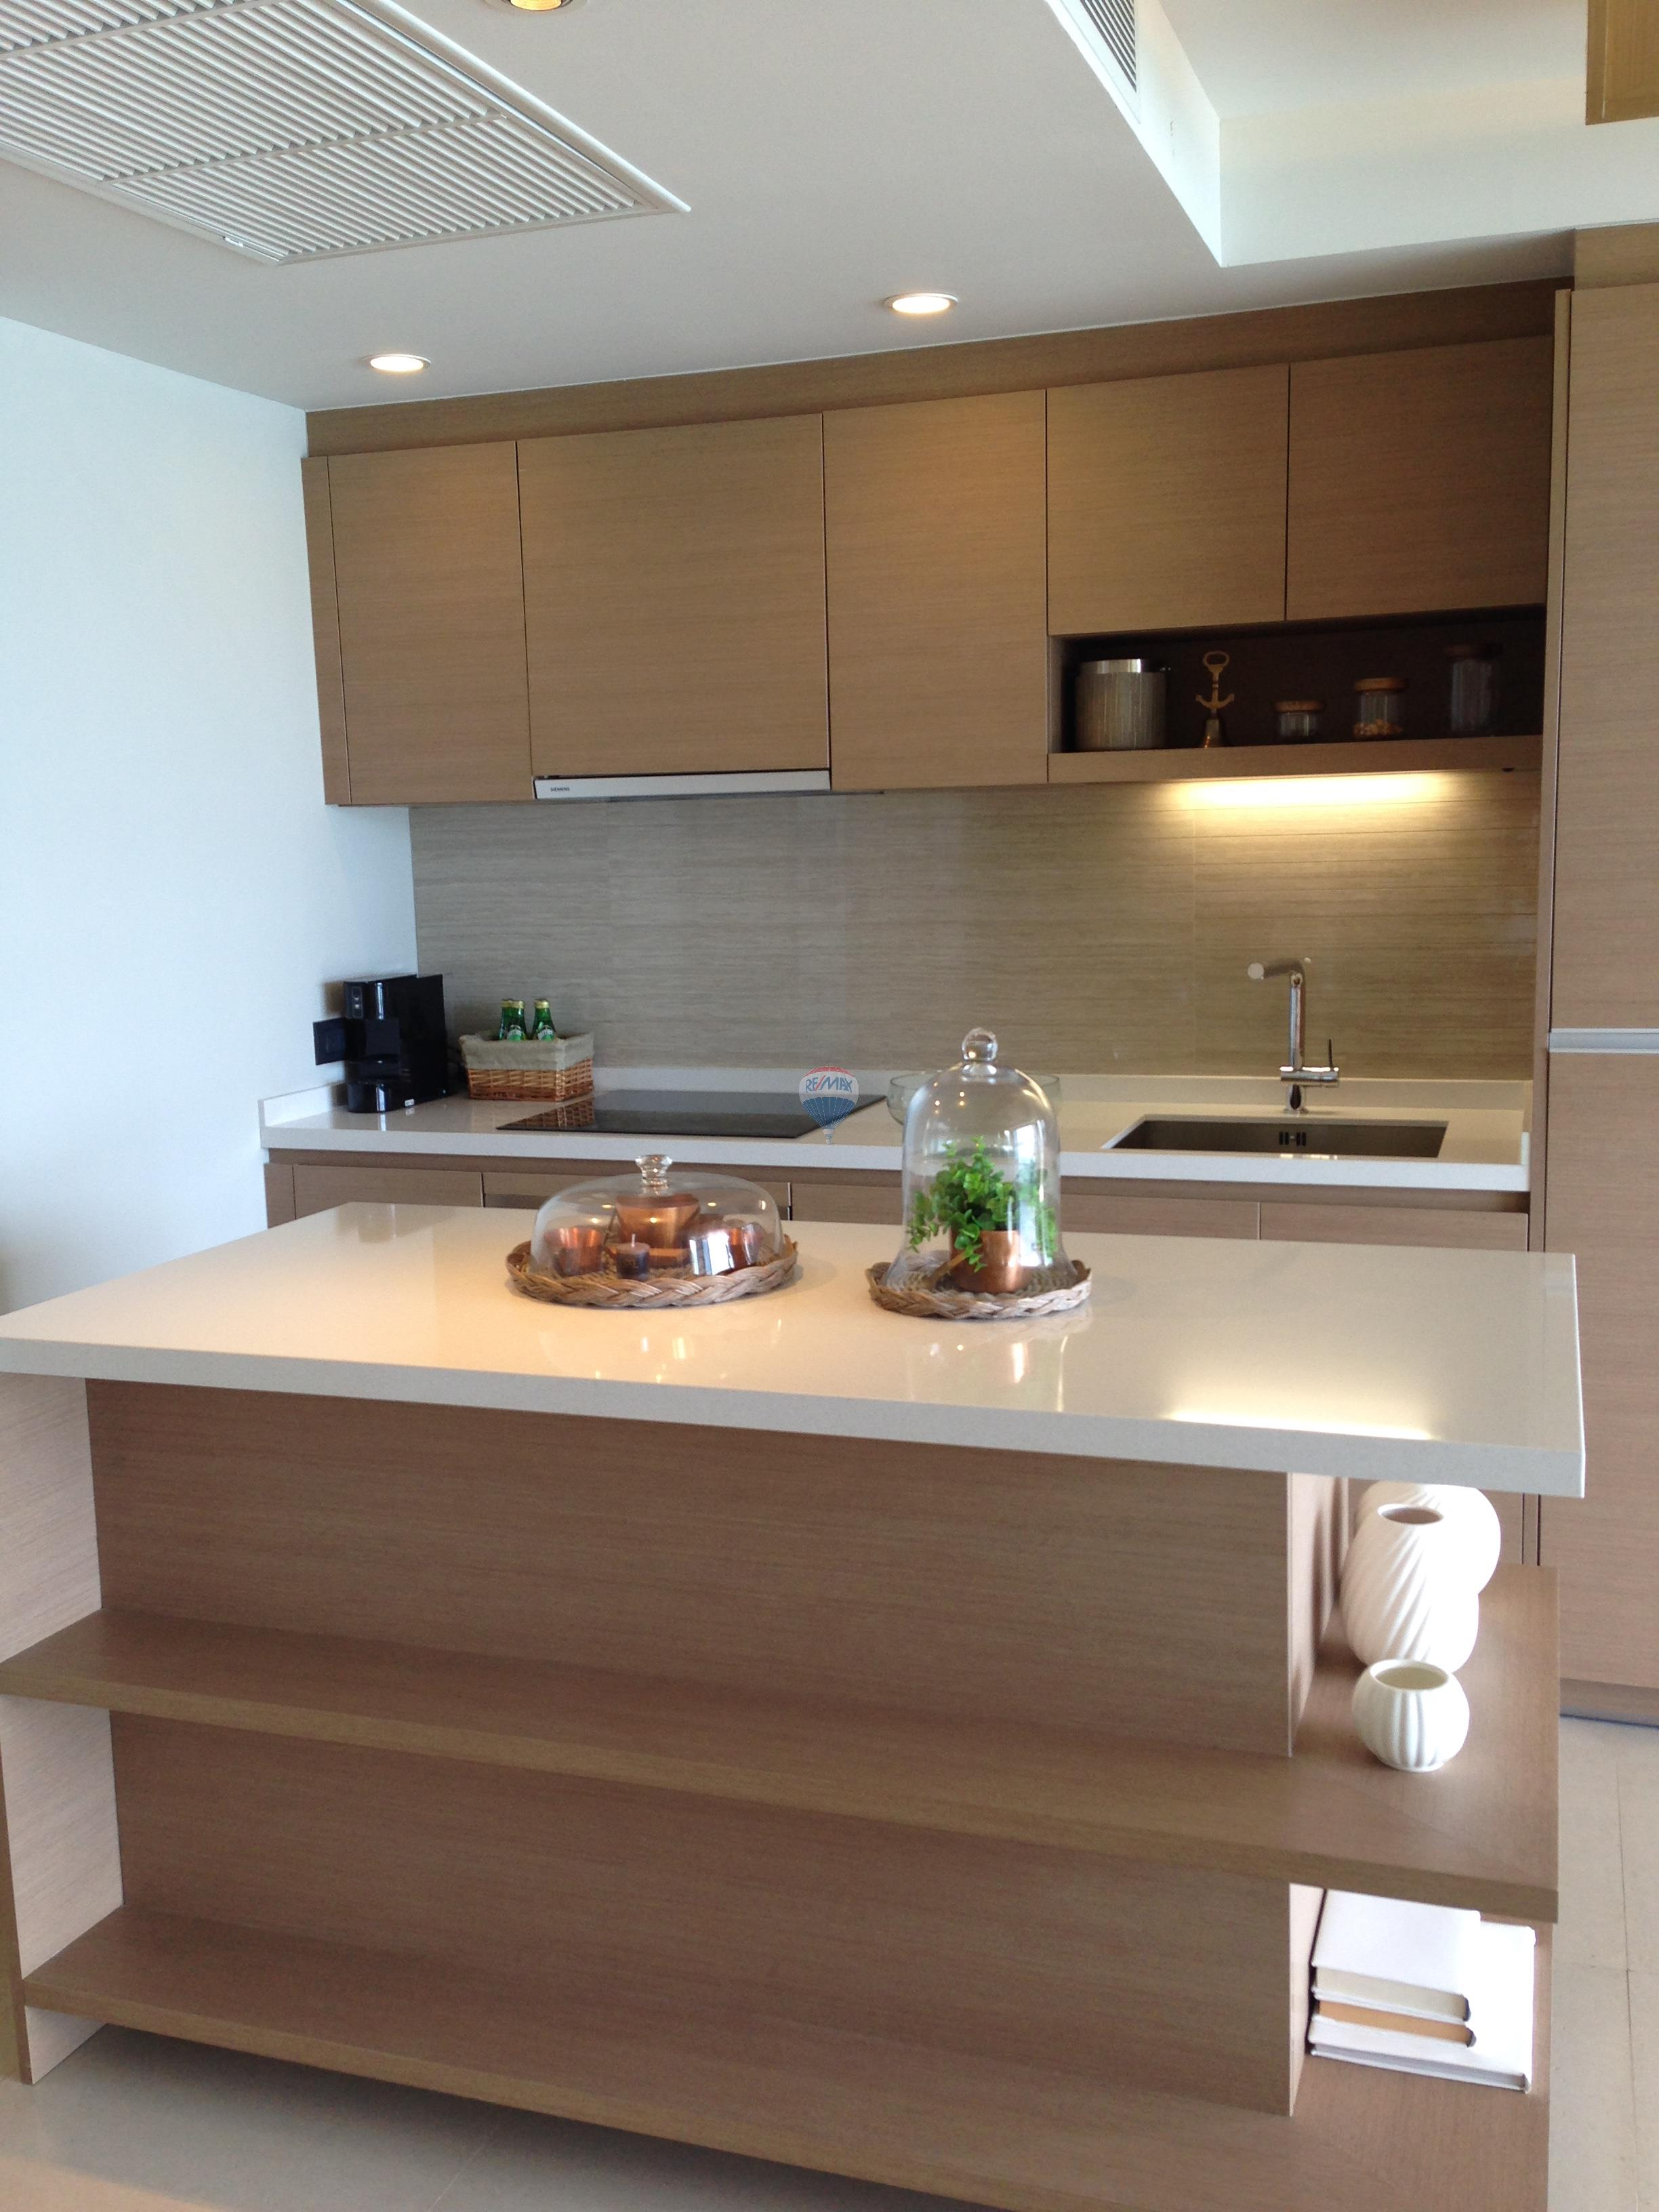 RE/MAX Top Properties Agency's Luxury 1 Bedroom Apartment overlooking Patong Bay 8